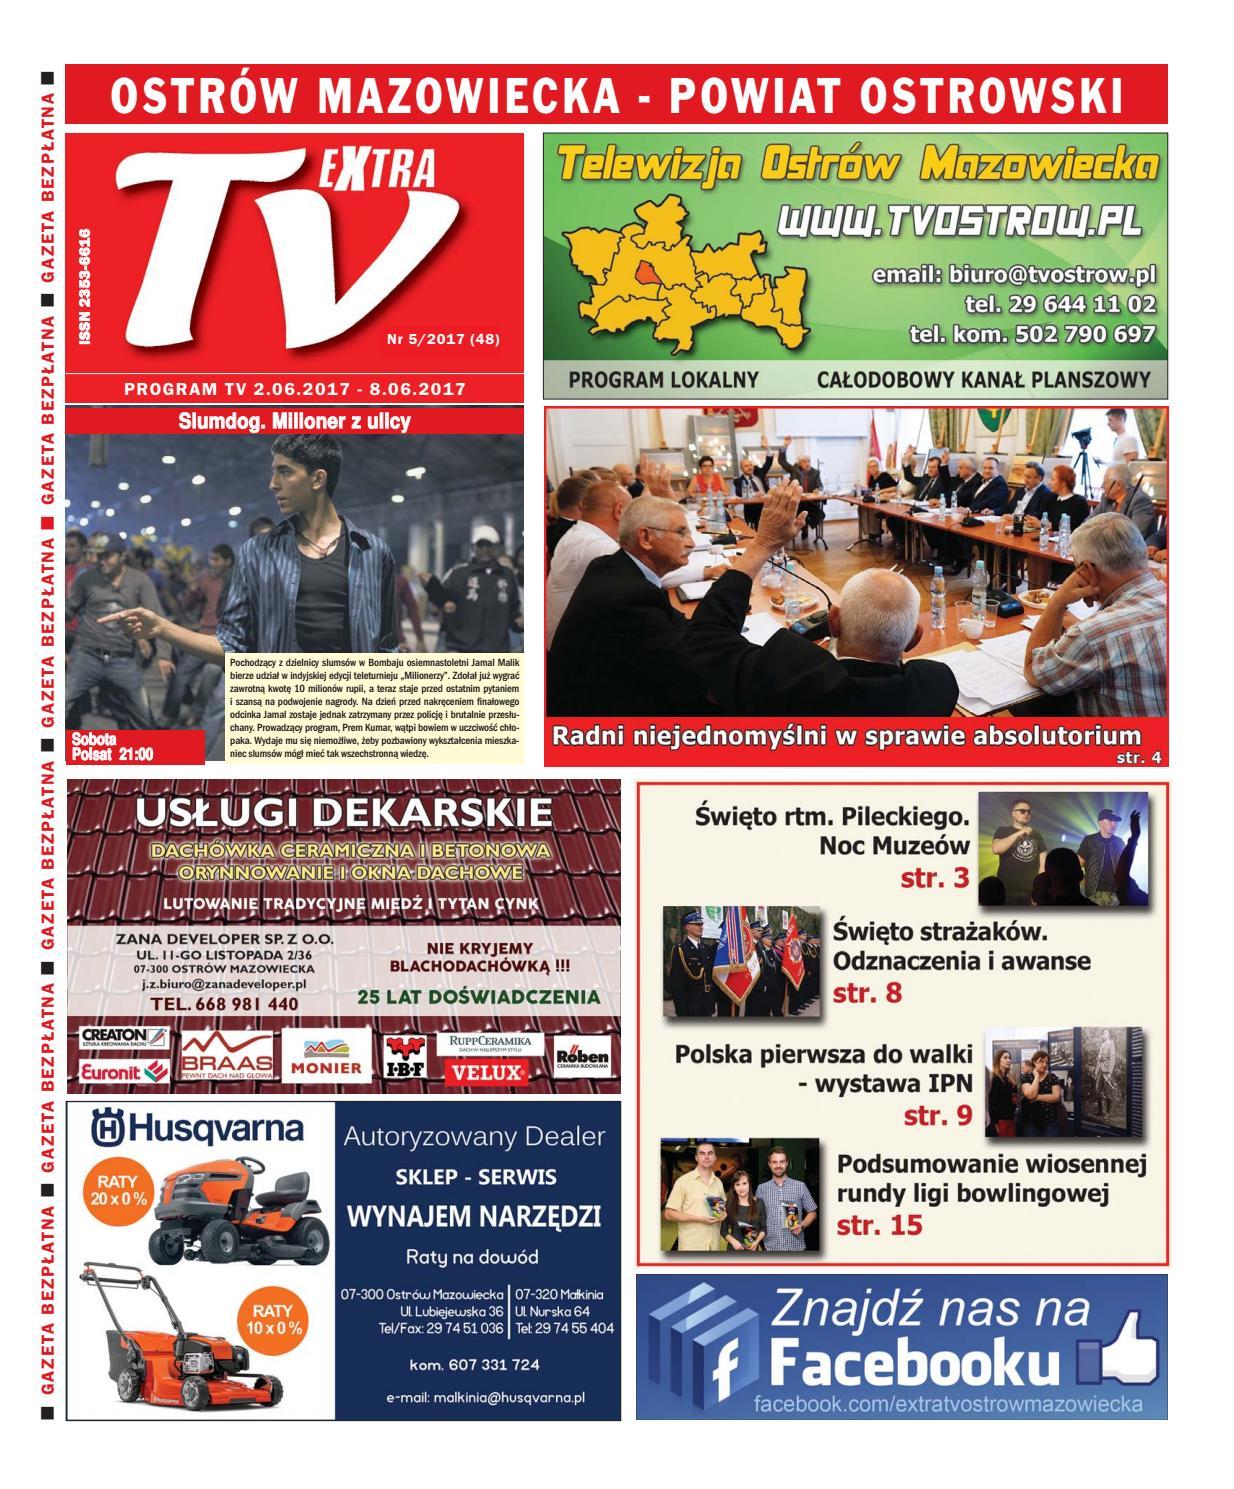 8e4cf36c4 Tv ostrow 5 2017 by TV Ostrów Mazowiecka - issuu